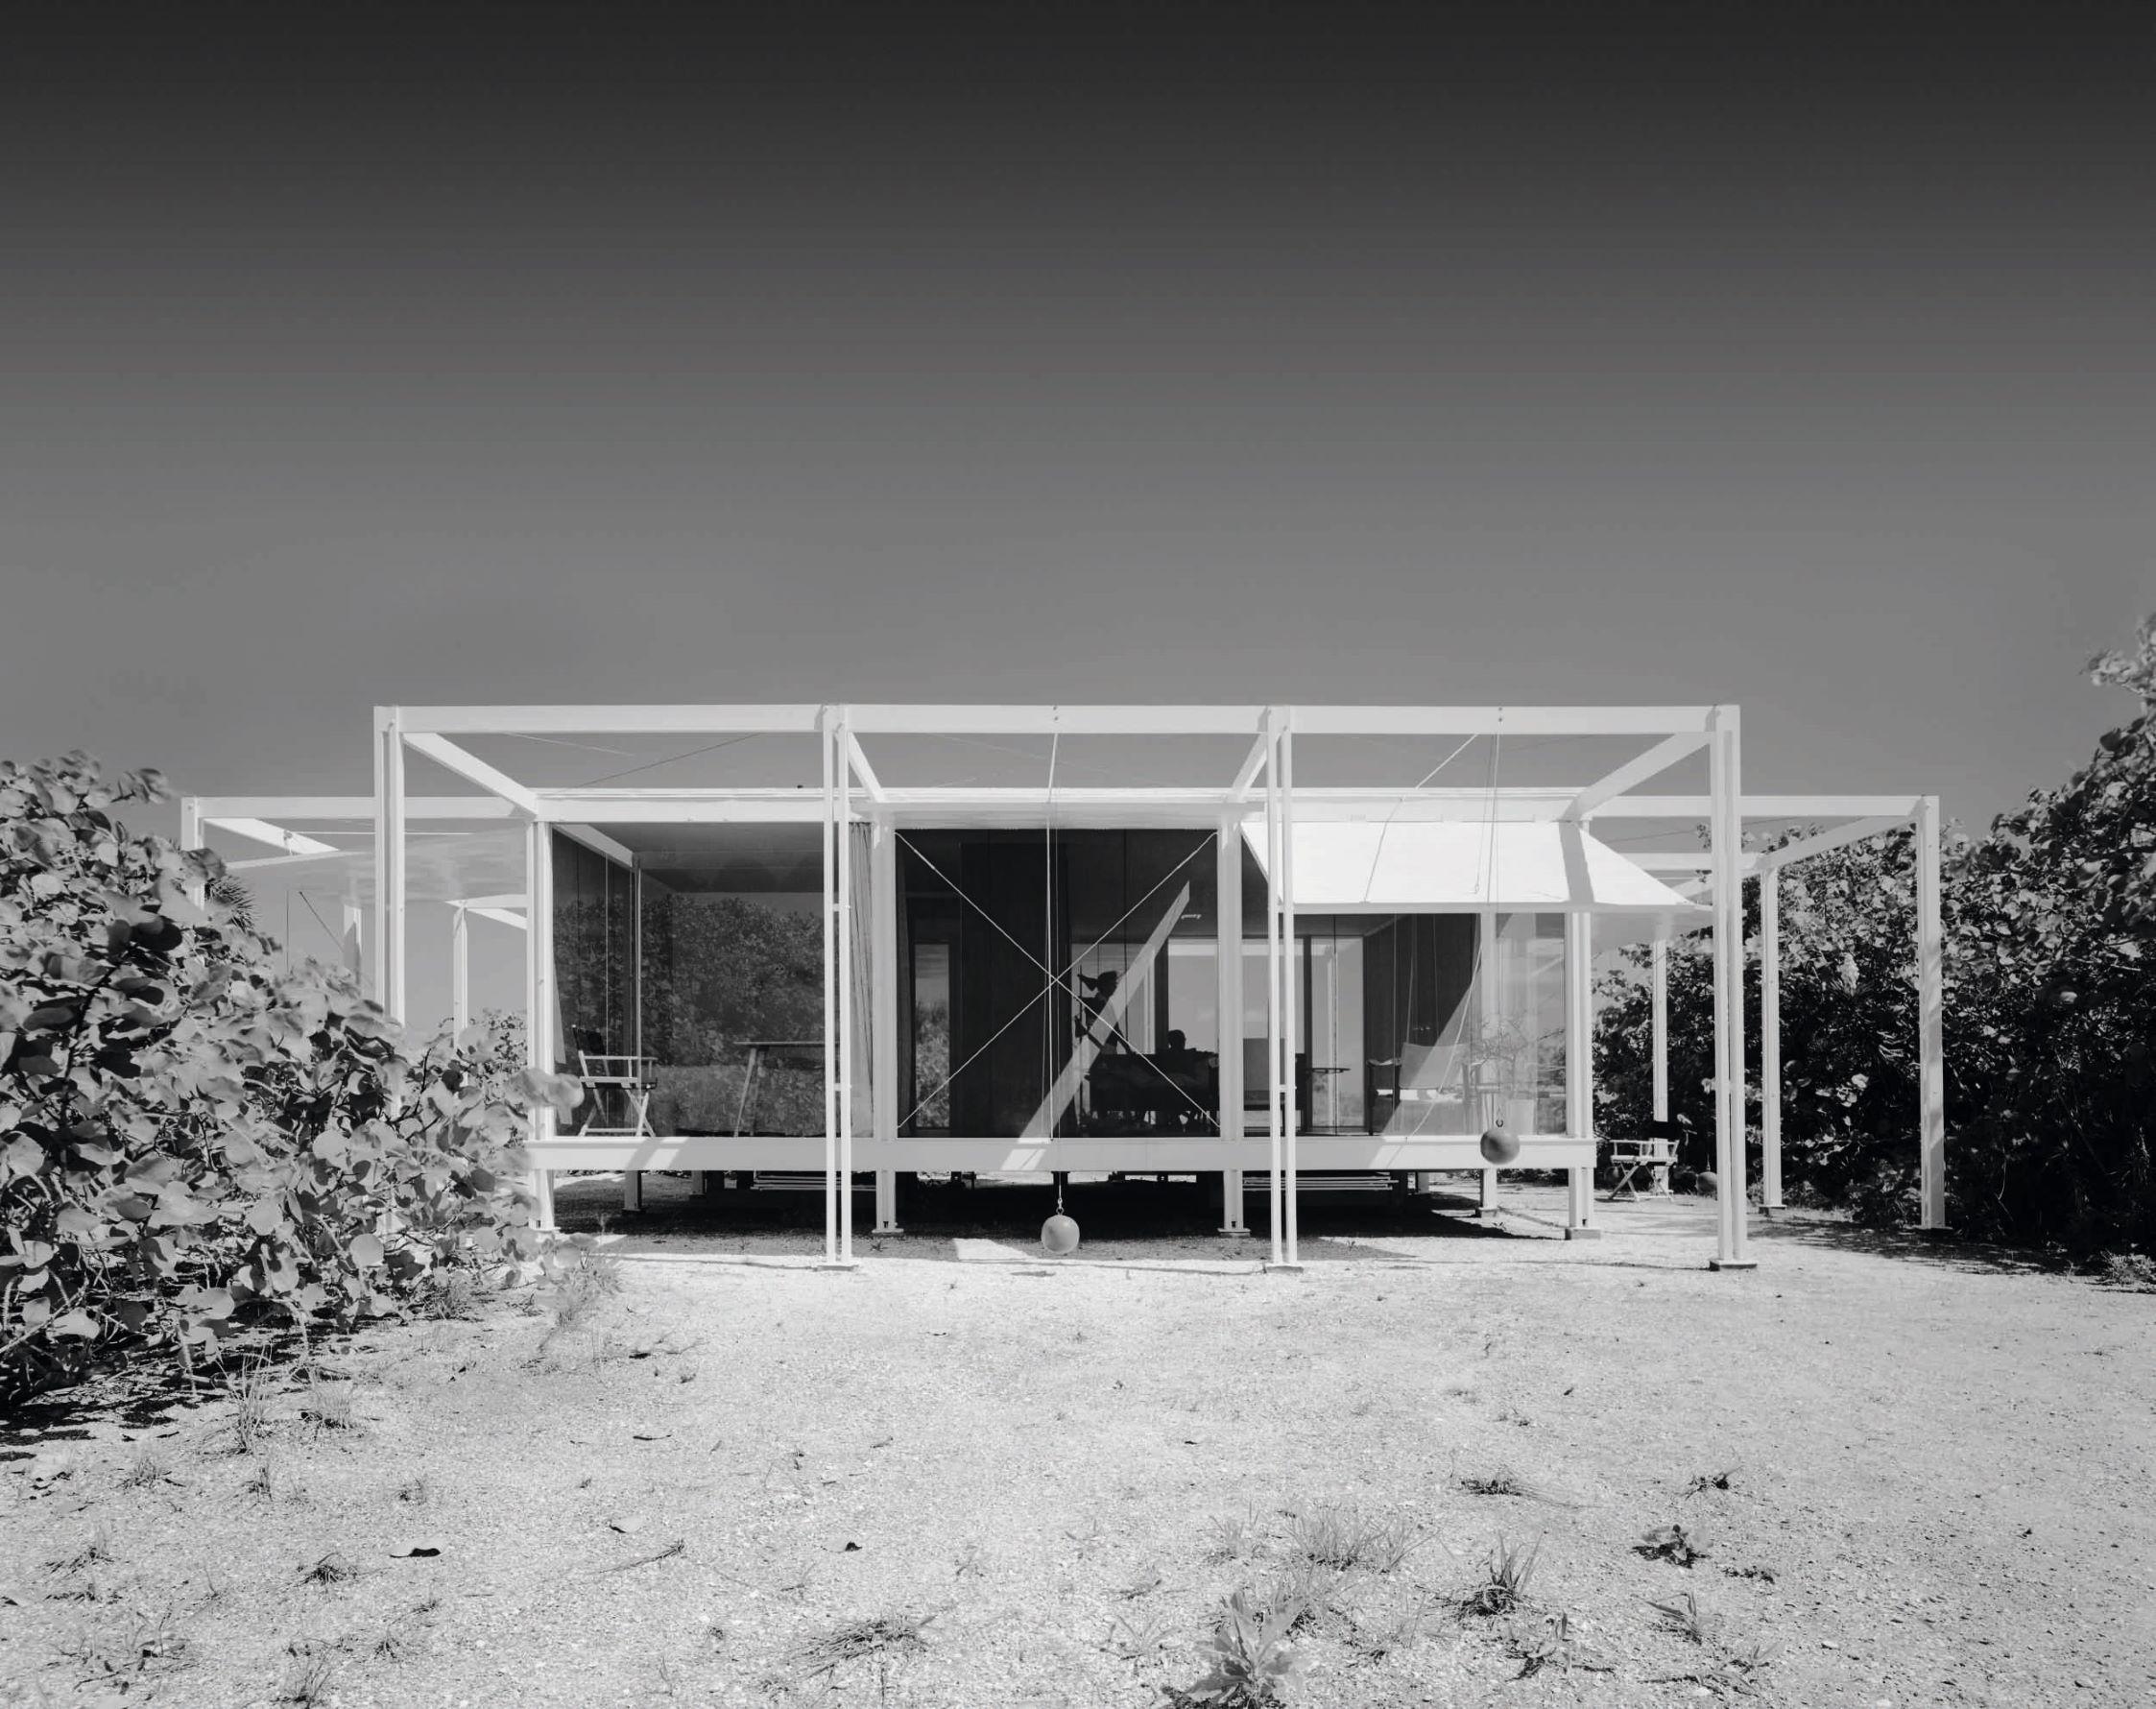 The Walker Guest House by Paul Rudolph,(1953) Sanibel Island, FL 1953, Ezra Stoller/Esto. All images © Ezra Stroller/ESTO Archive, courtesy of Sotheby's